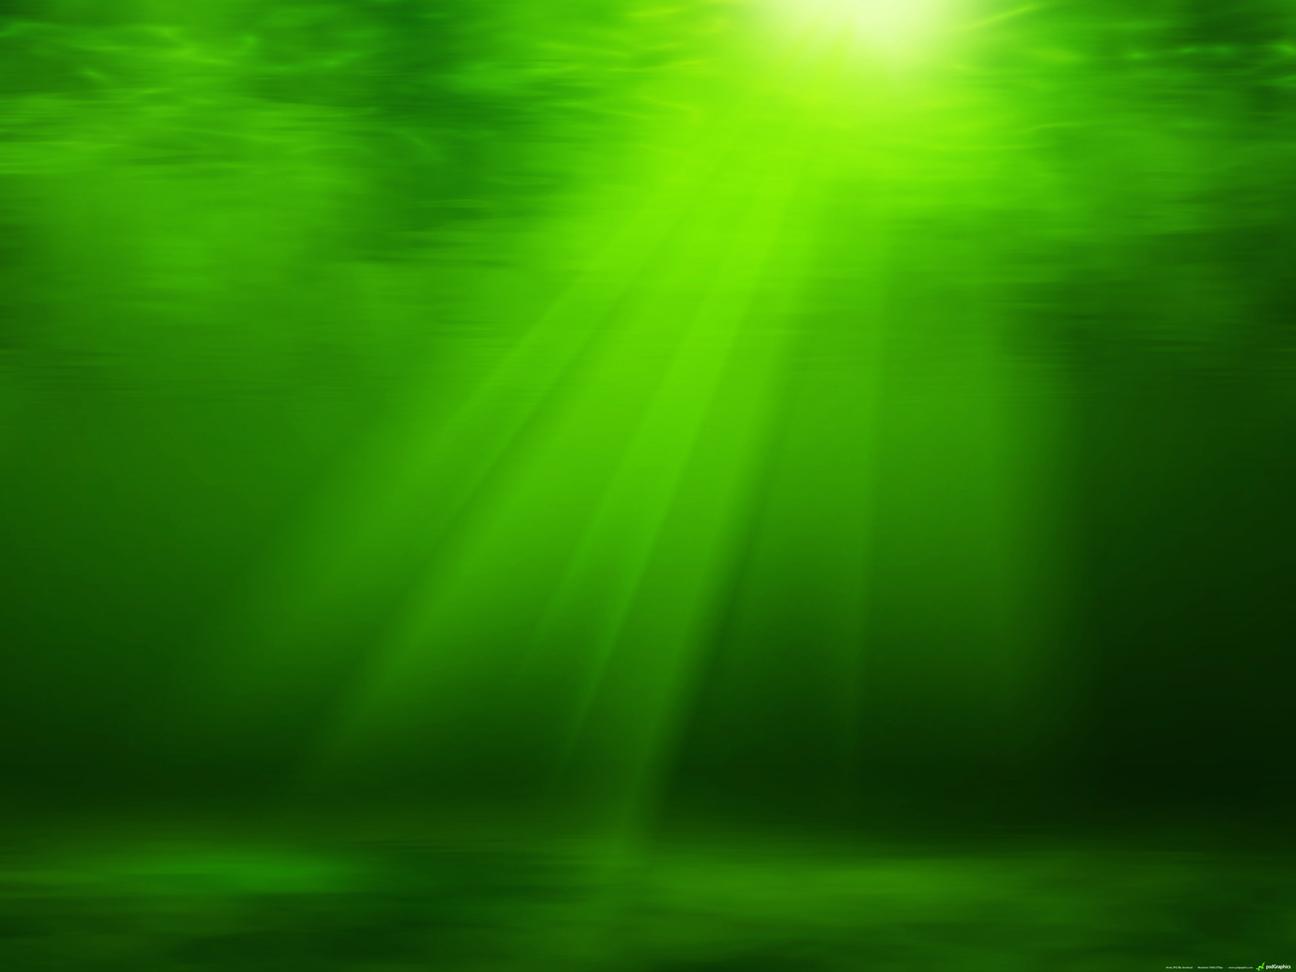 Bono Gratis Con Rollover Robux Hack Underwater Green Jpg Shamrock New Orleans